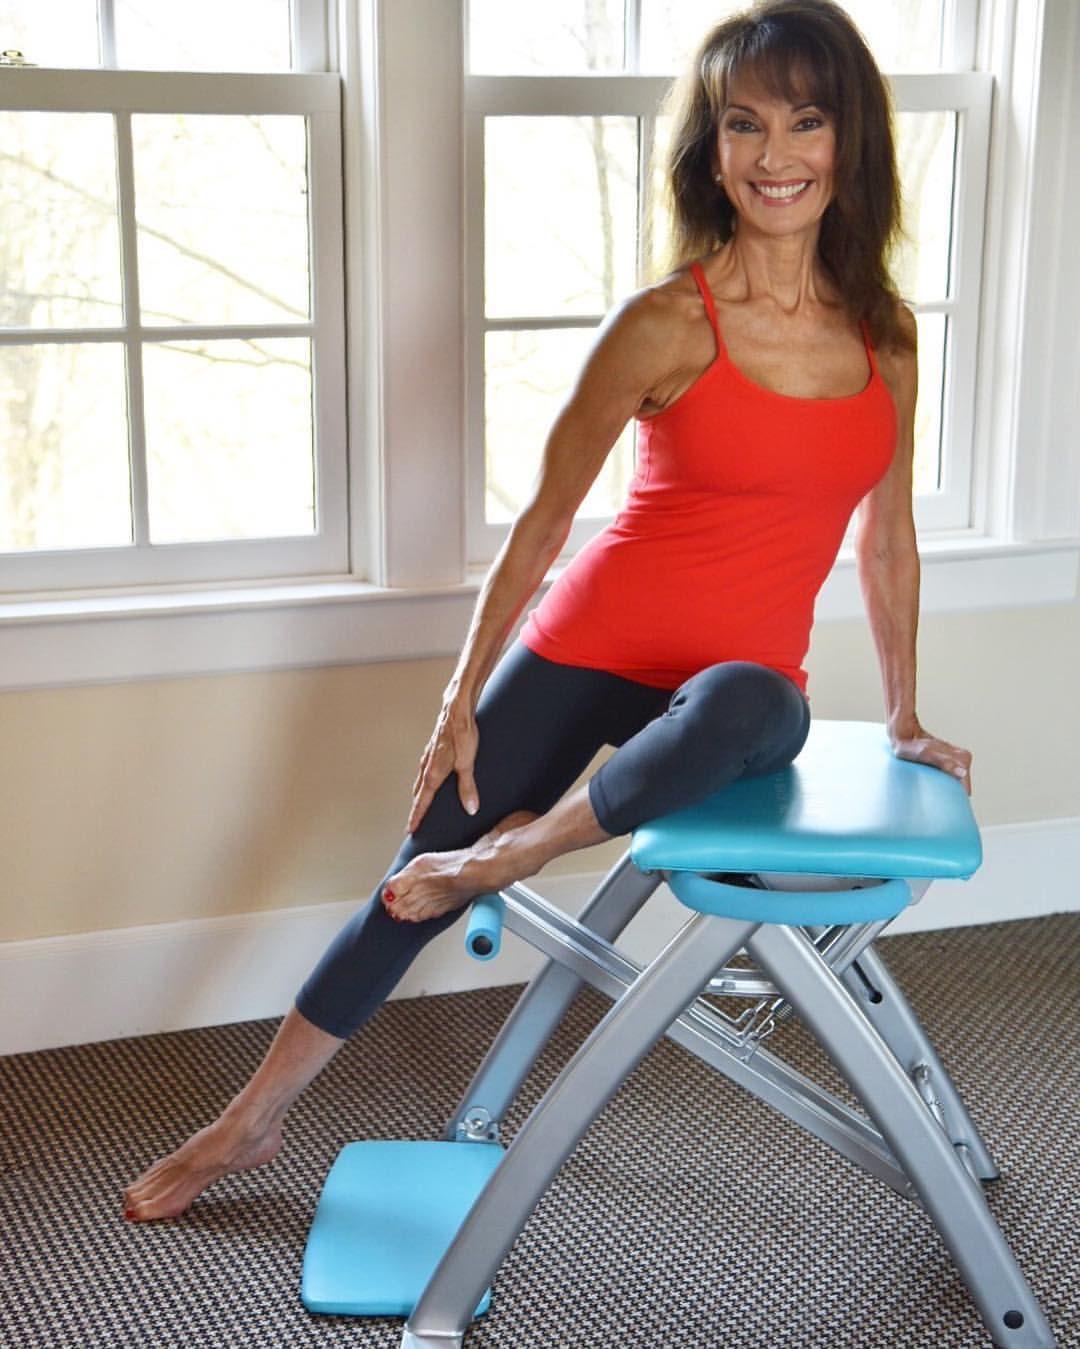 Pilates Chair Dvds Lifes Beach: Pin By Terri Ann Kisaberth On Exercise